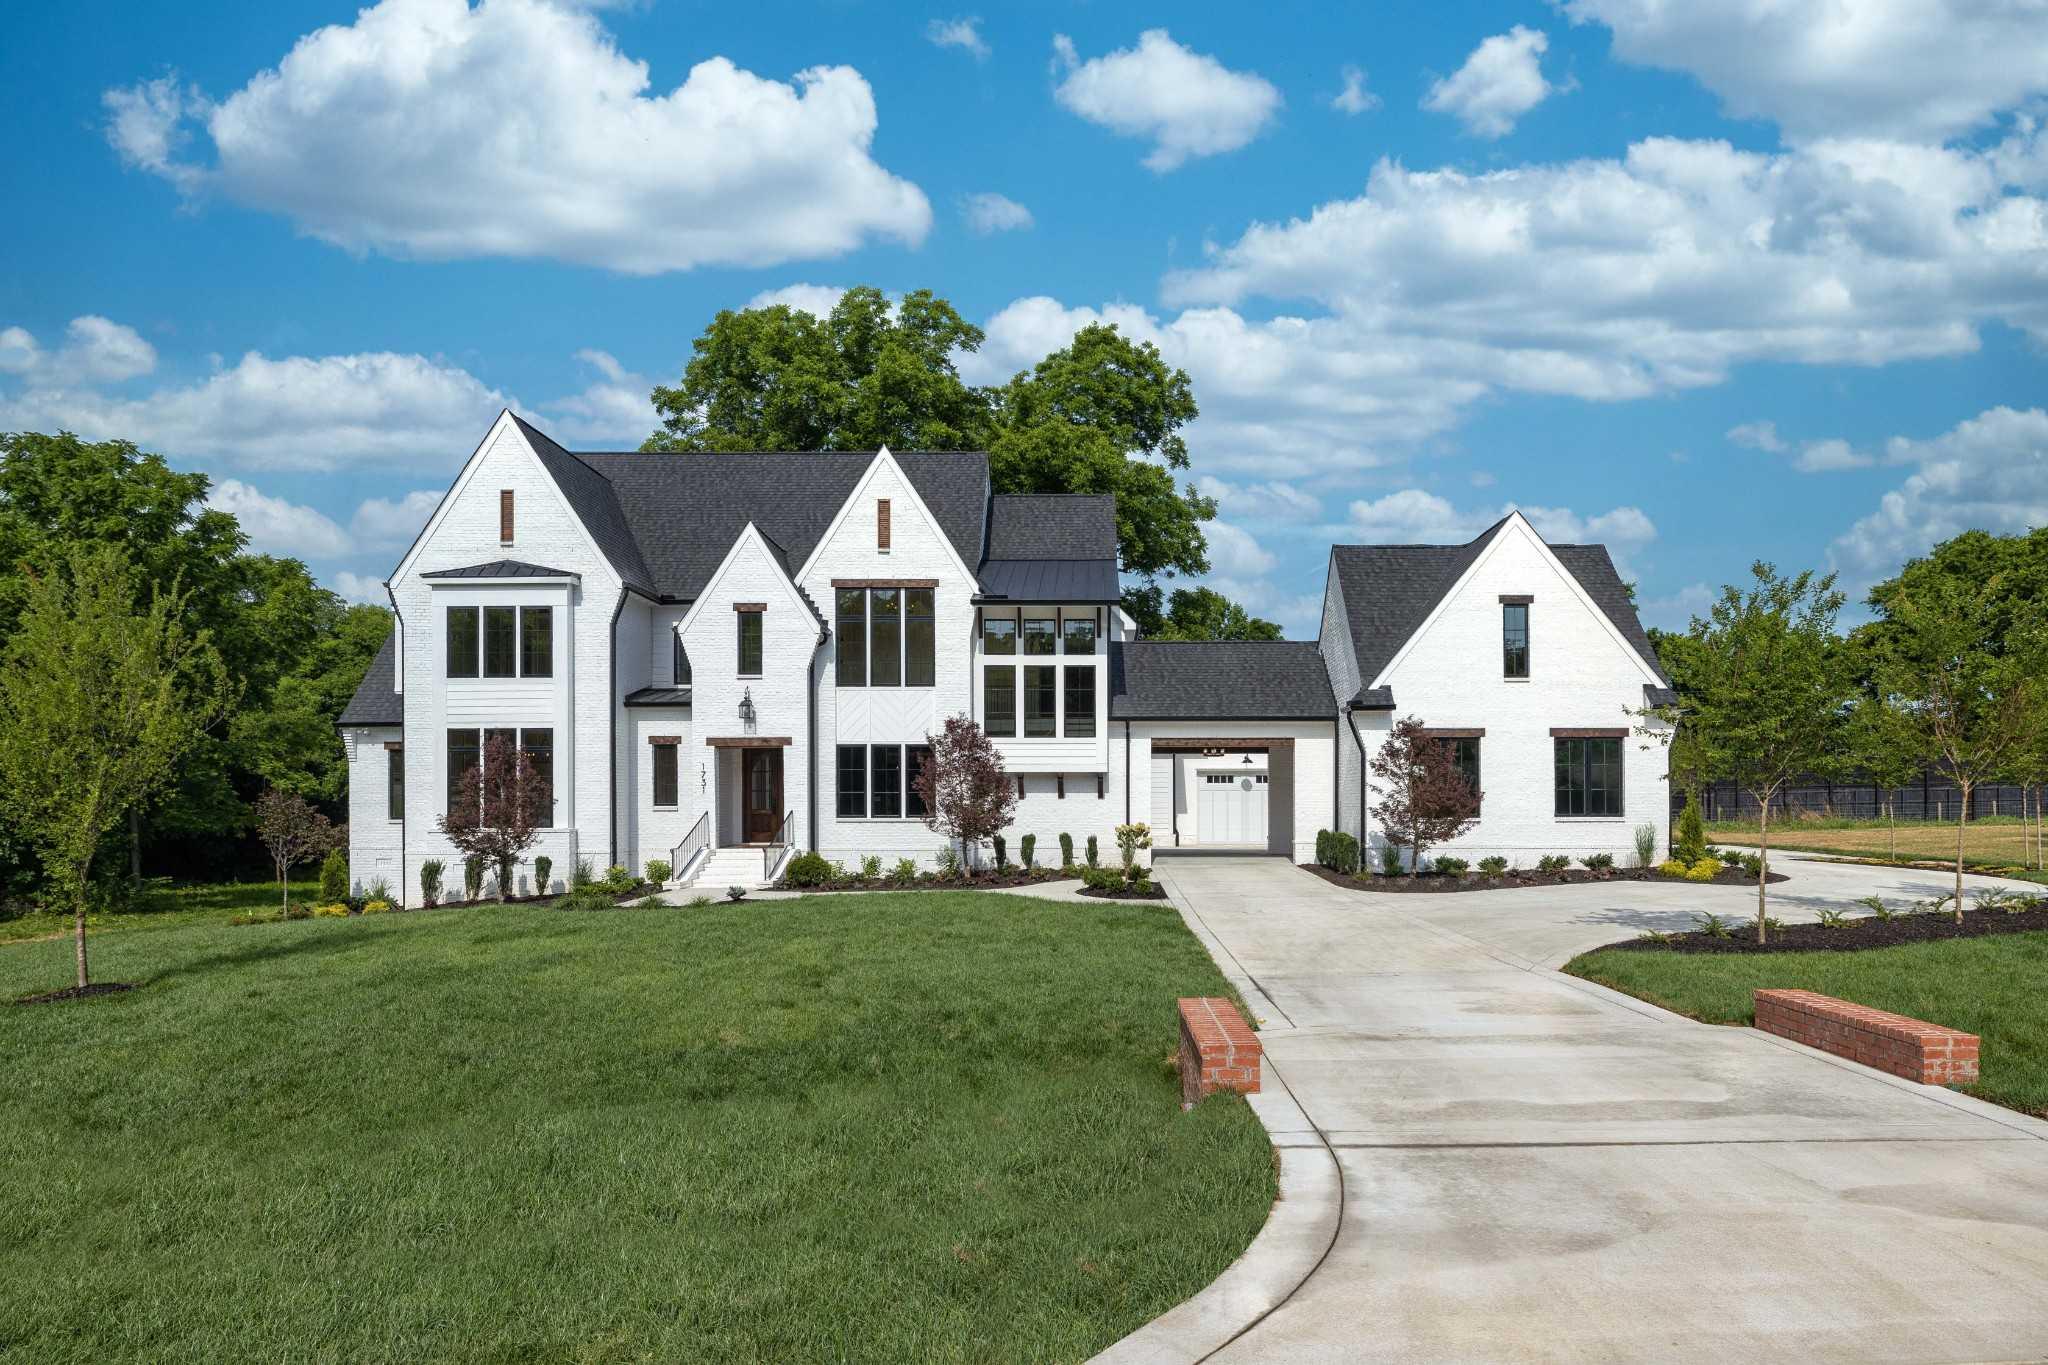 $3,695,000 - 4Br/6Ba -  for Sale in Leipers Fork/franklin, Franklin